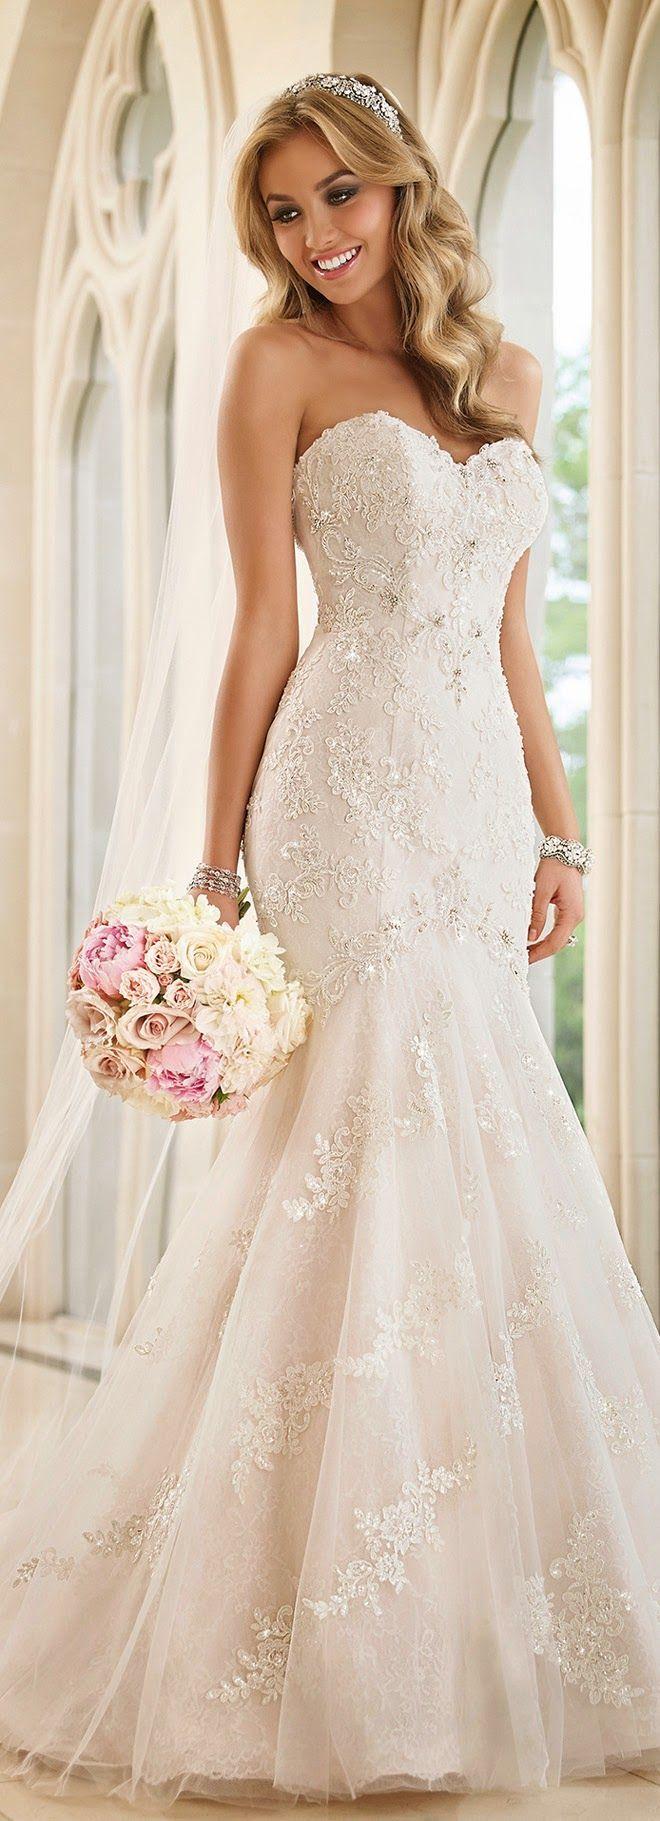 Blush mermaid wedding dress  Wedding Dresses  Stella York Fall  Bridal Collection  Special